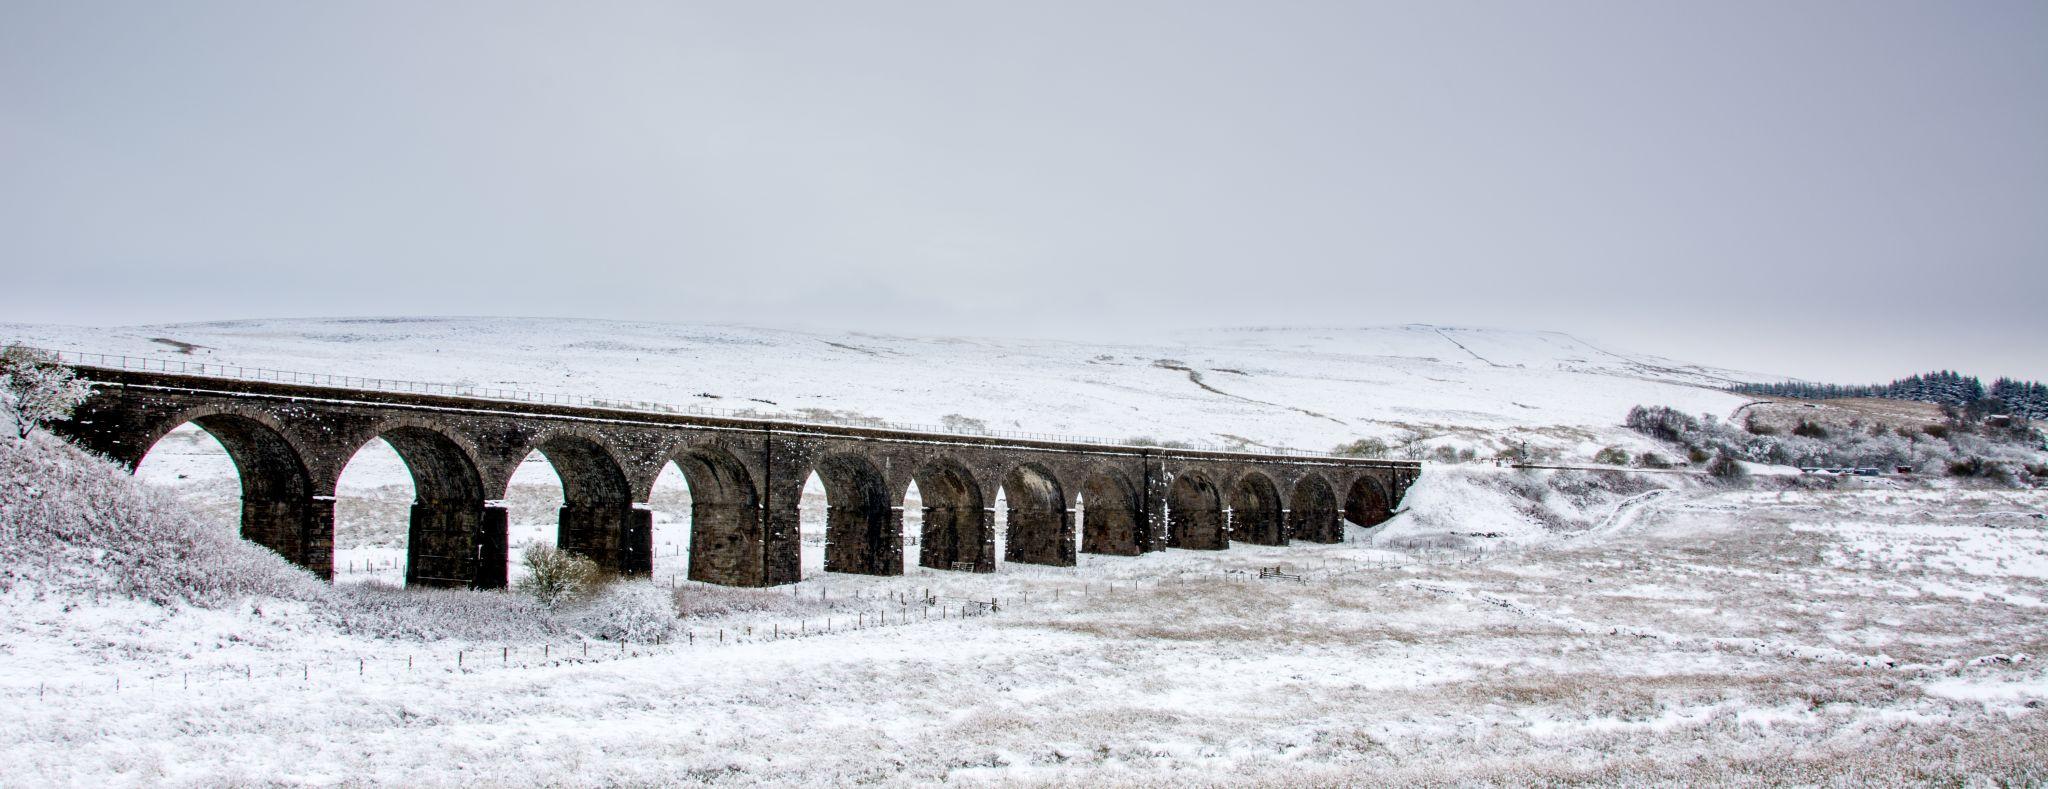 Dandry Mire Viaduct, United Kingdom